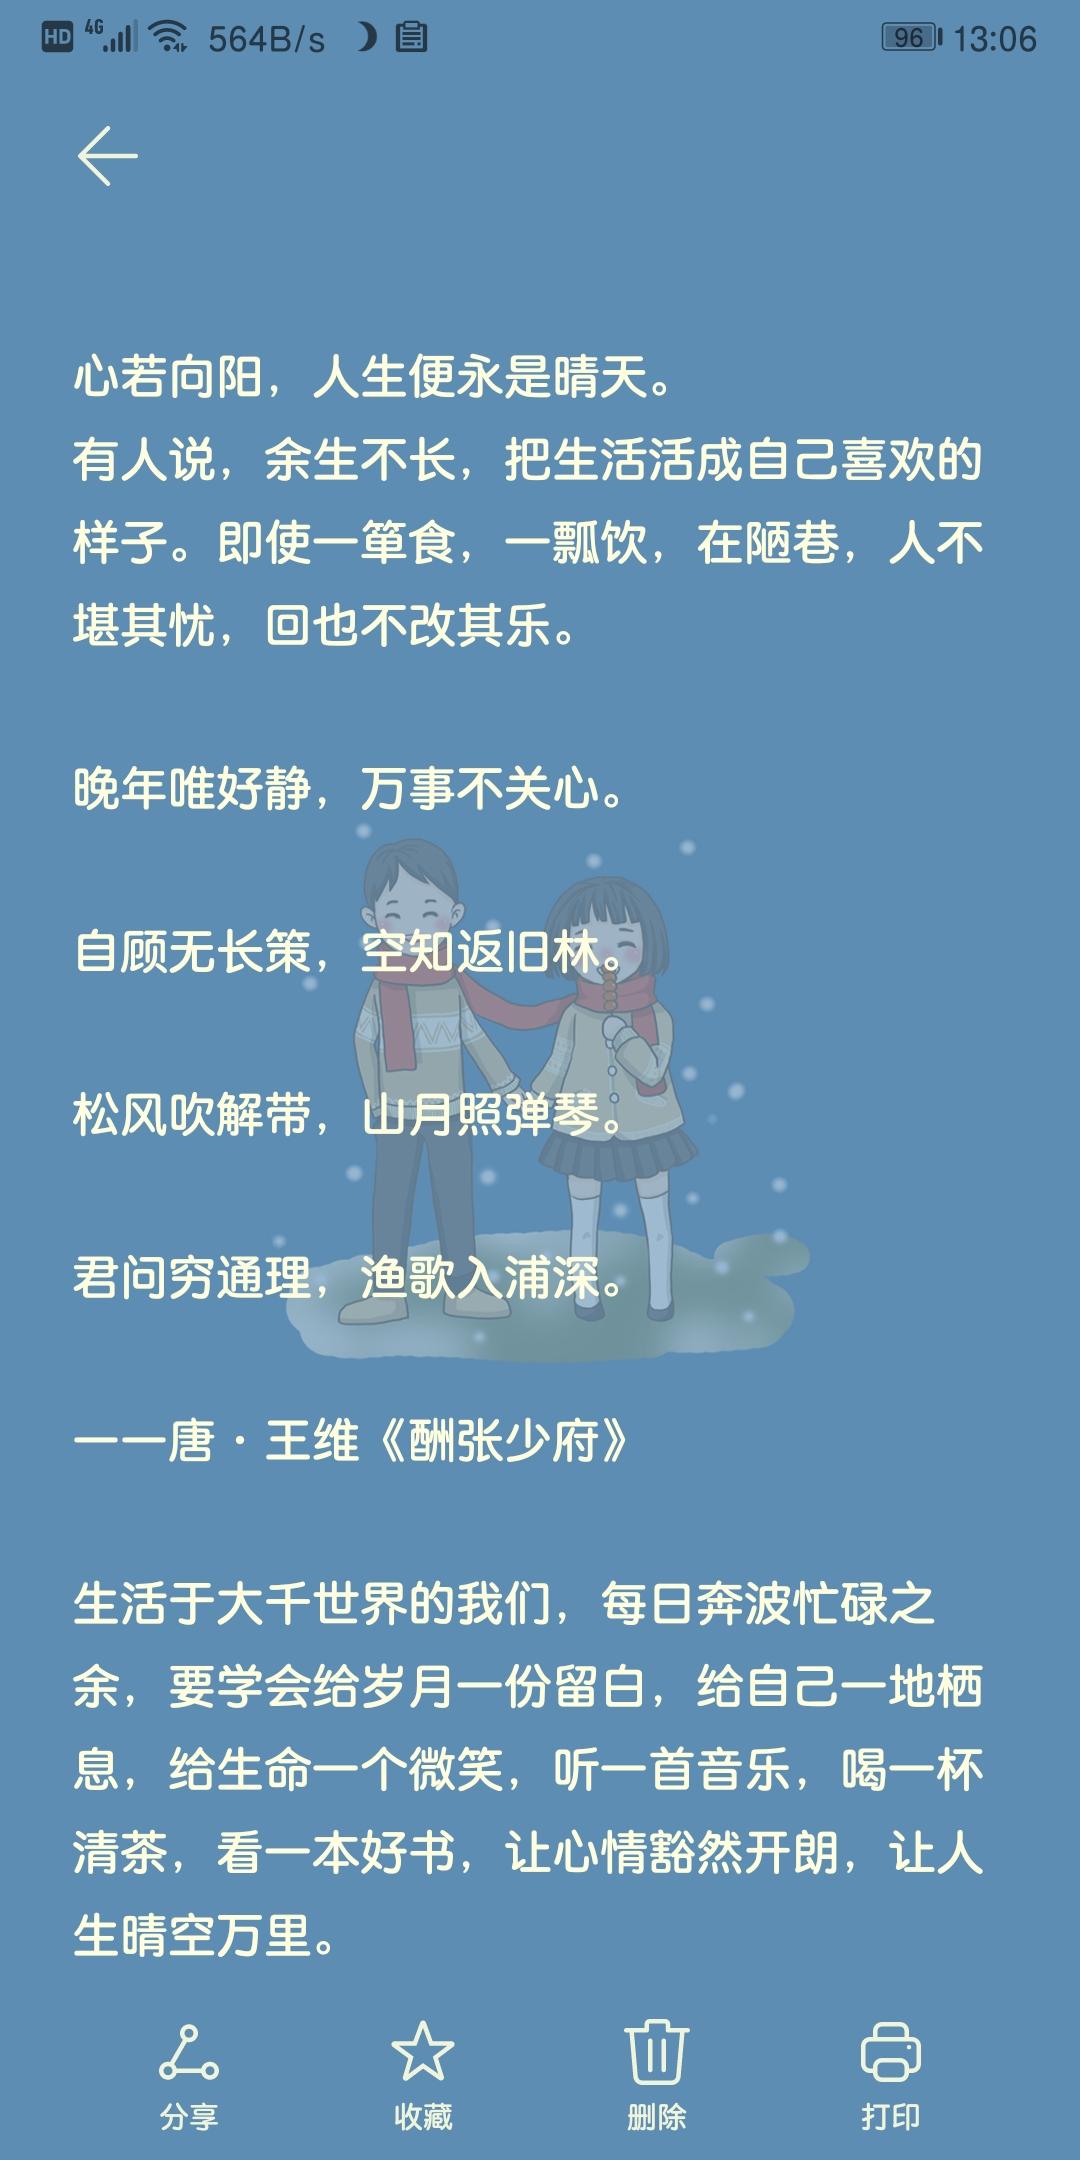 Screenshot_20200204_130623_com.example.android.notepad.jpg